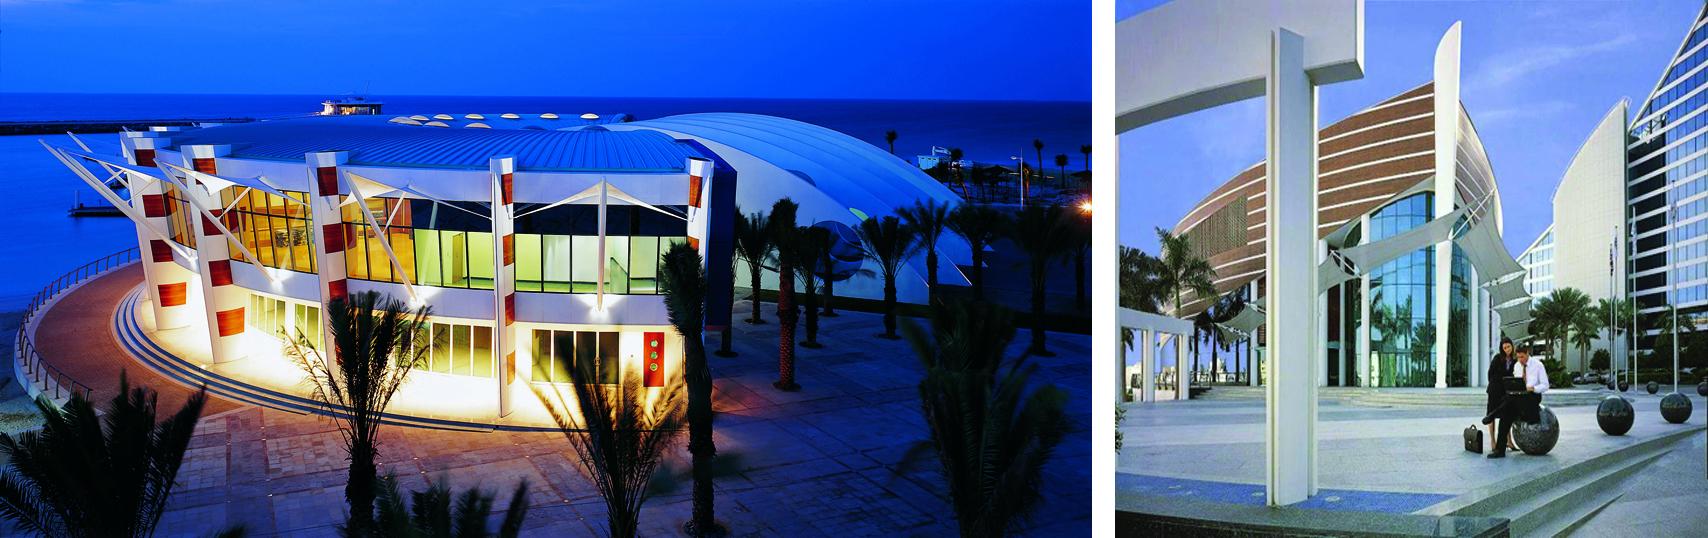 Jumeirah Beach Hotel 14 WKK.jpg